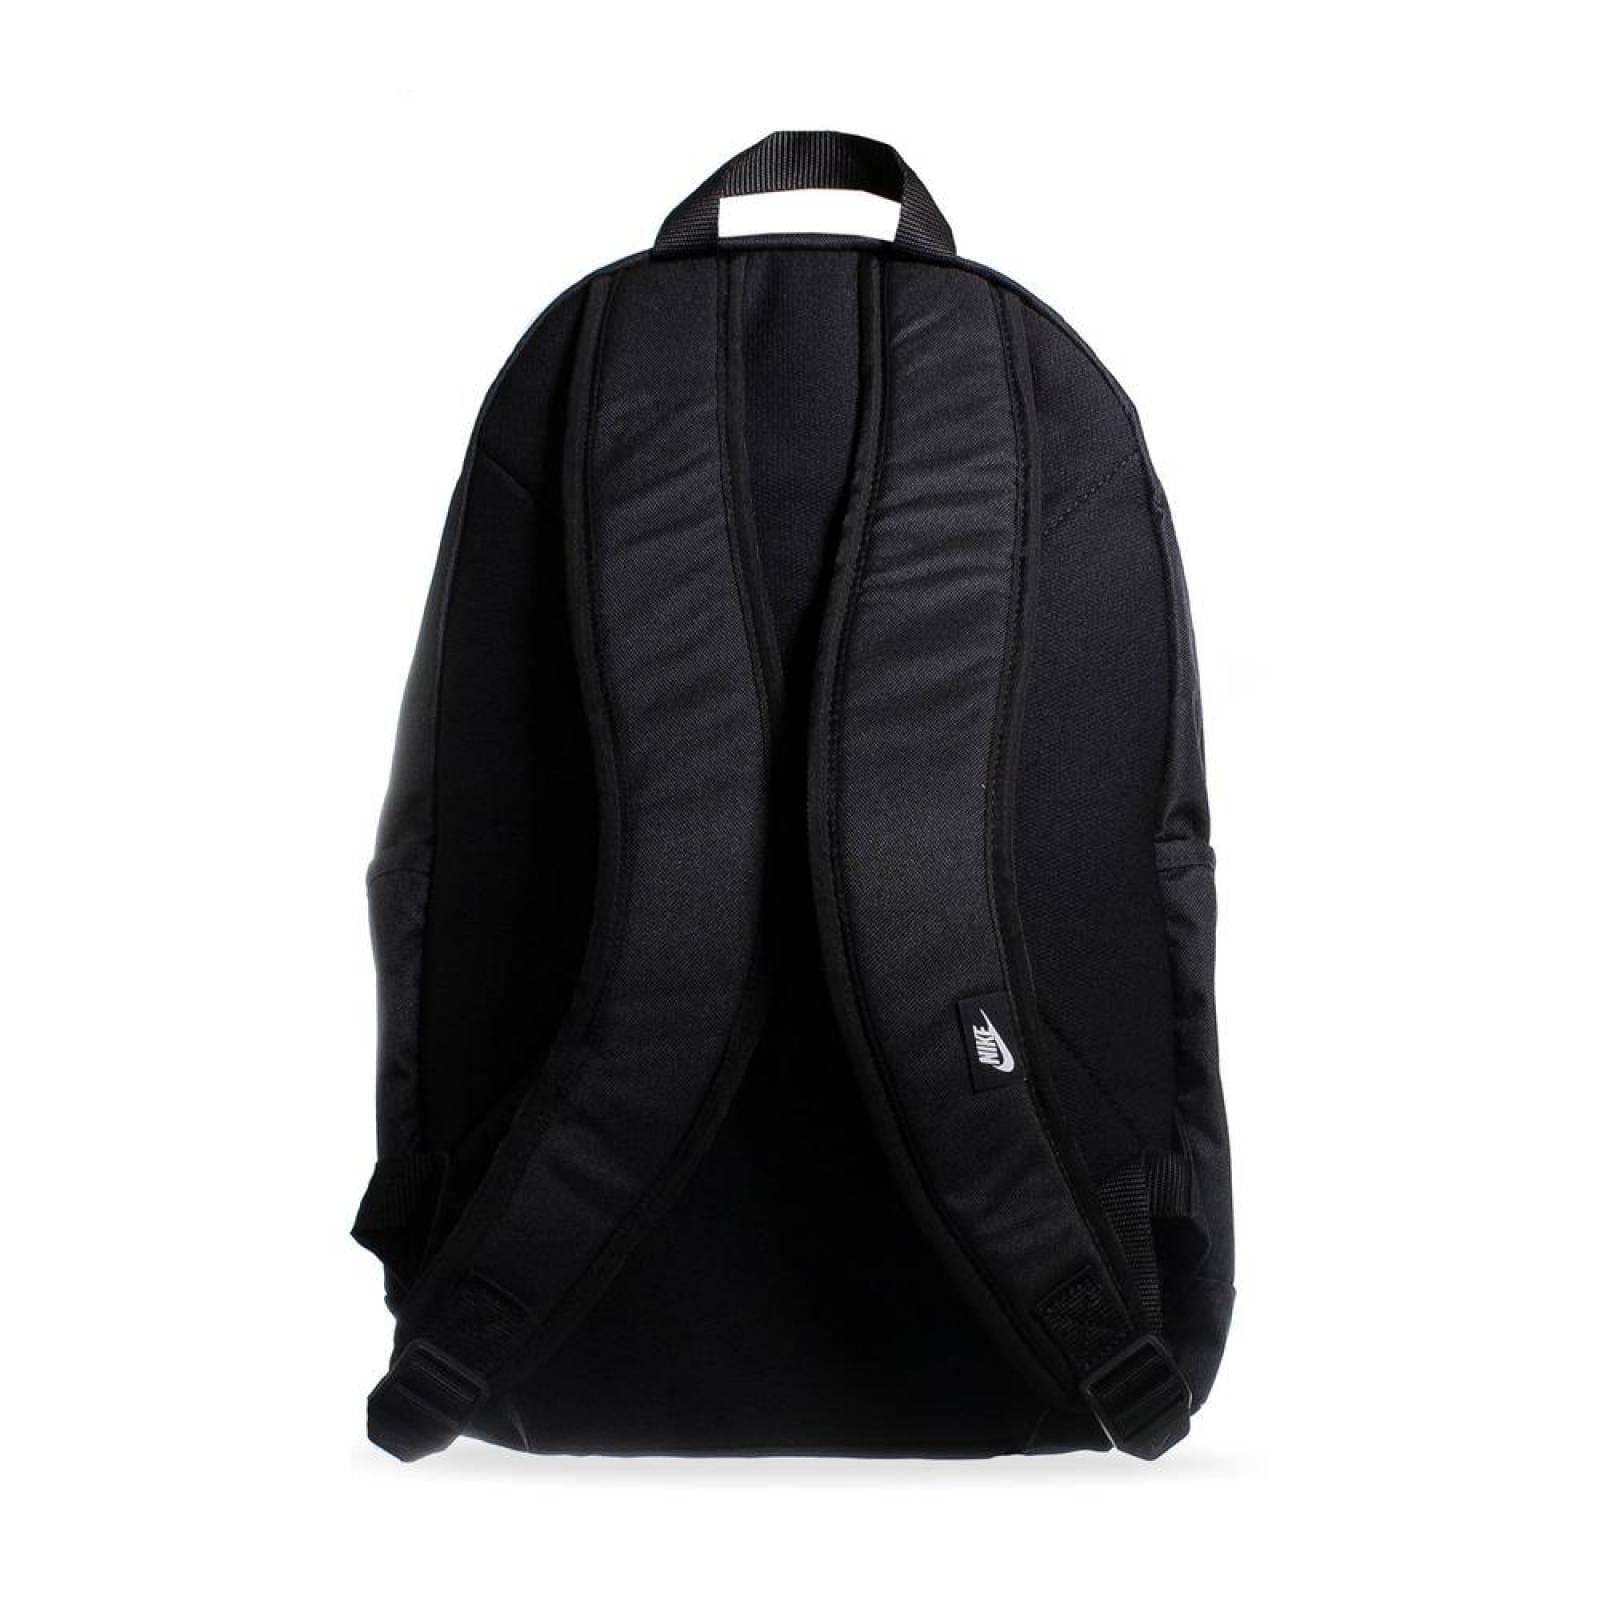 Mochila Nike Elmnt BA5381010 Negro Unisex